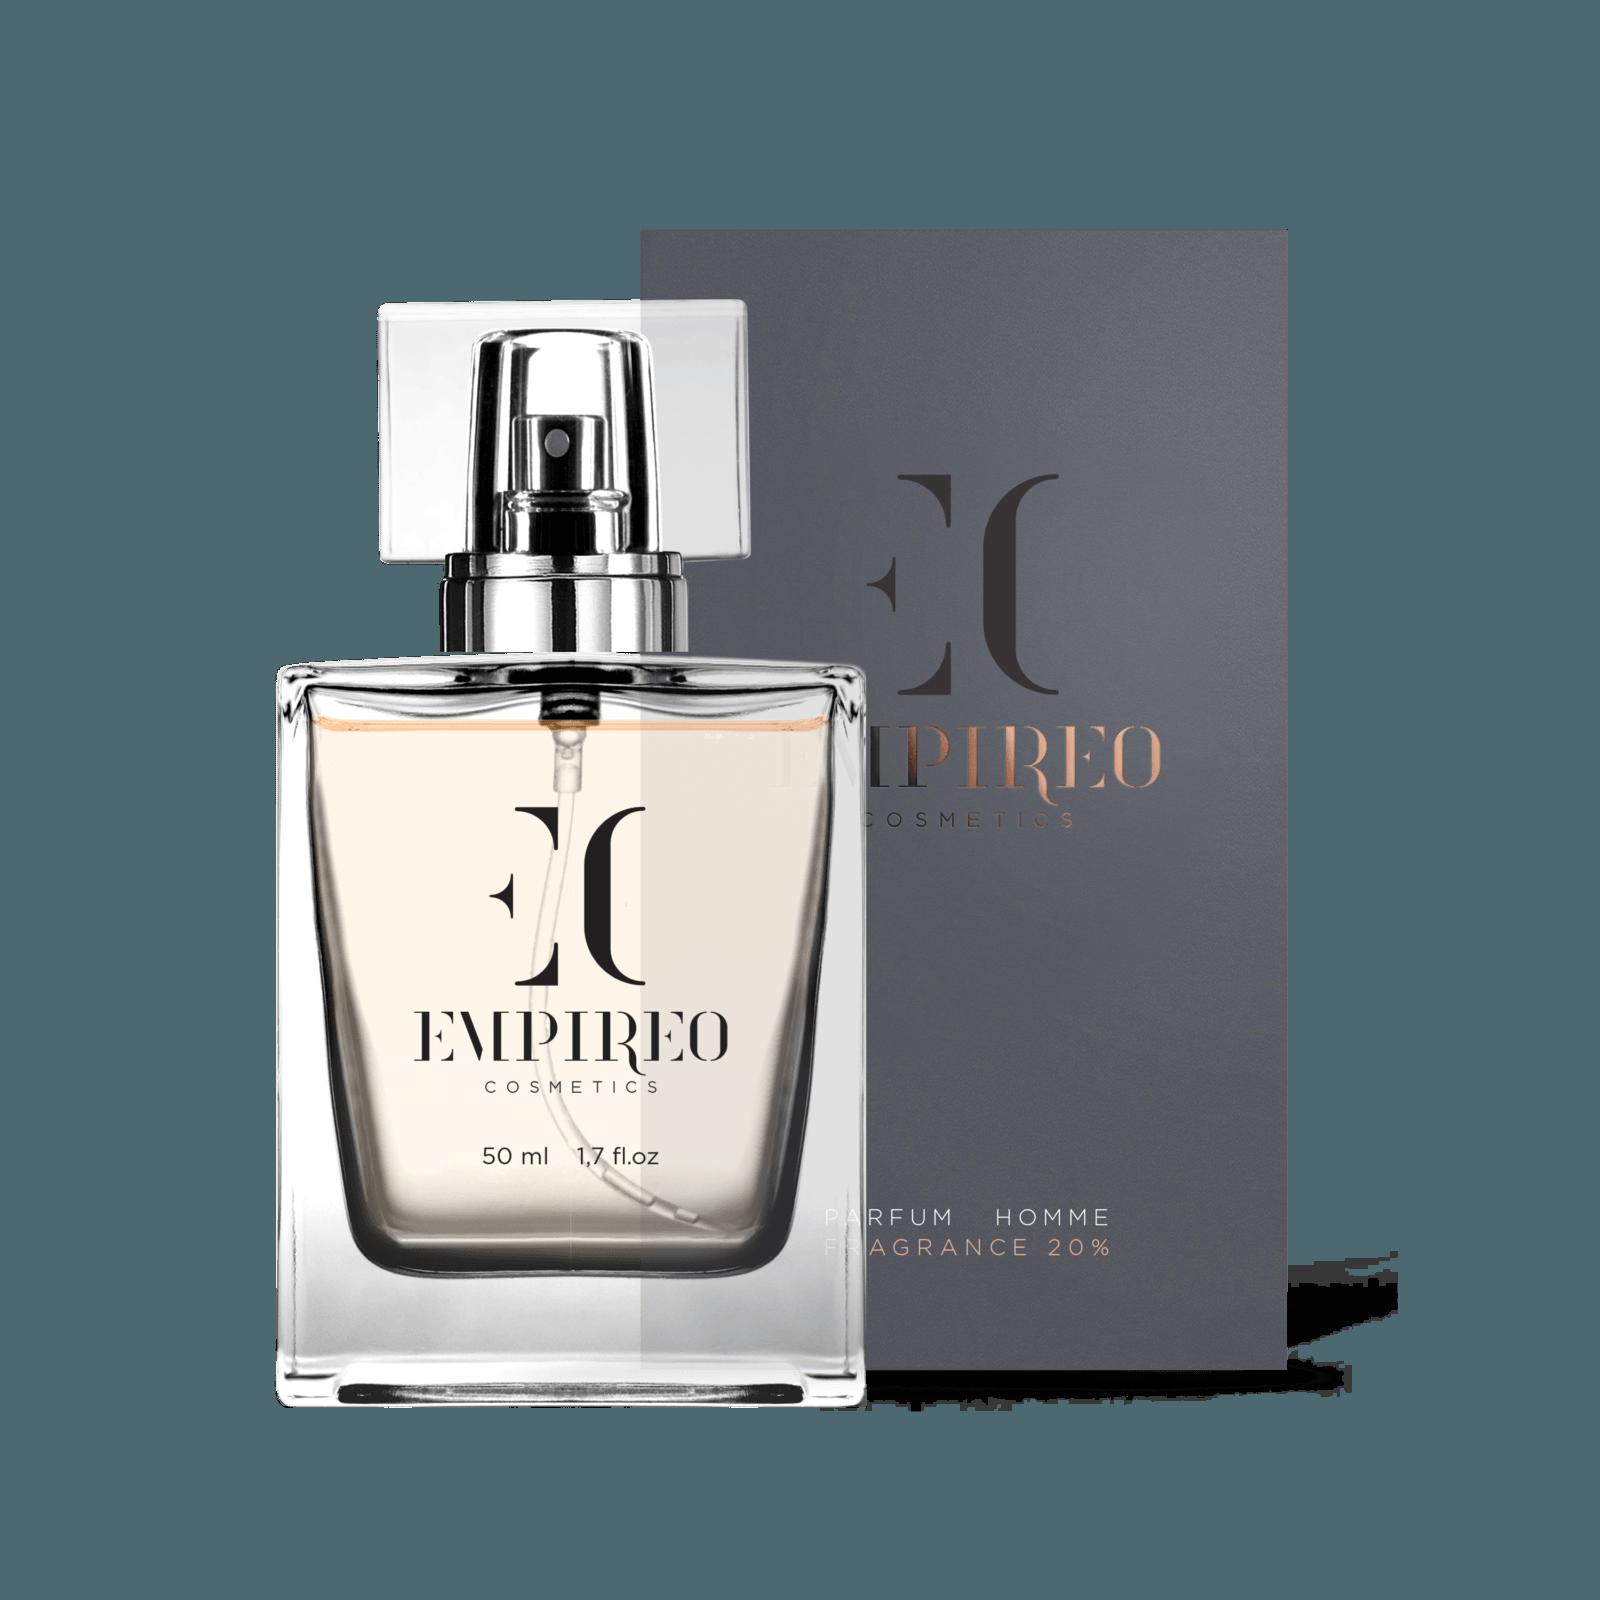 аромат 72для любителей Gaultier Le Male Jean Paul парфюмерия